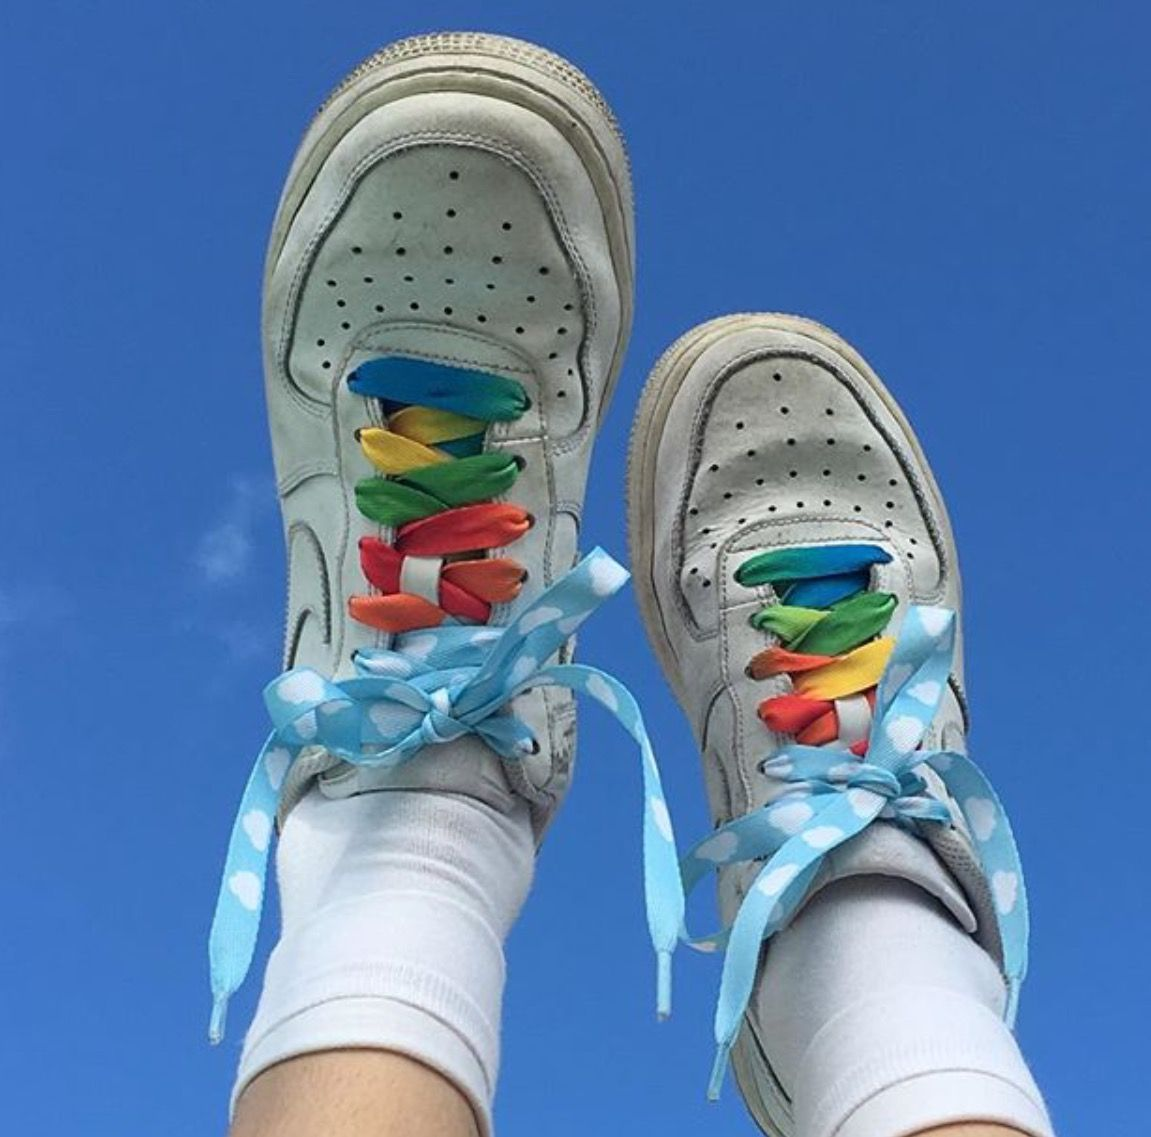 kimmiecla Closet Para Zapatos 8f3fee5bceb66